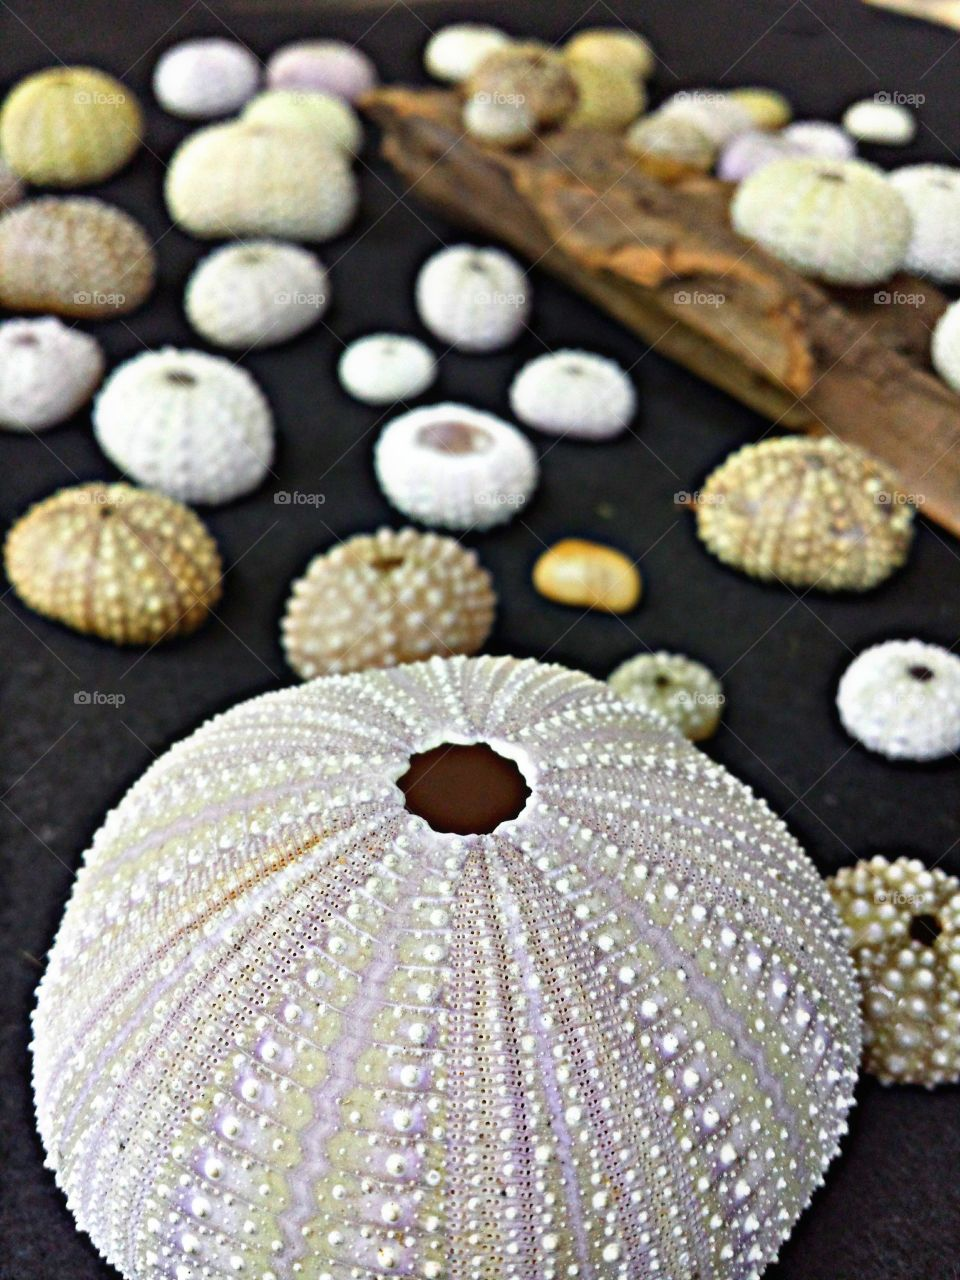 Close-up of sea urchin